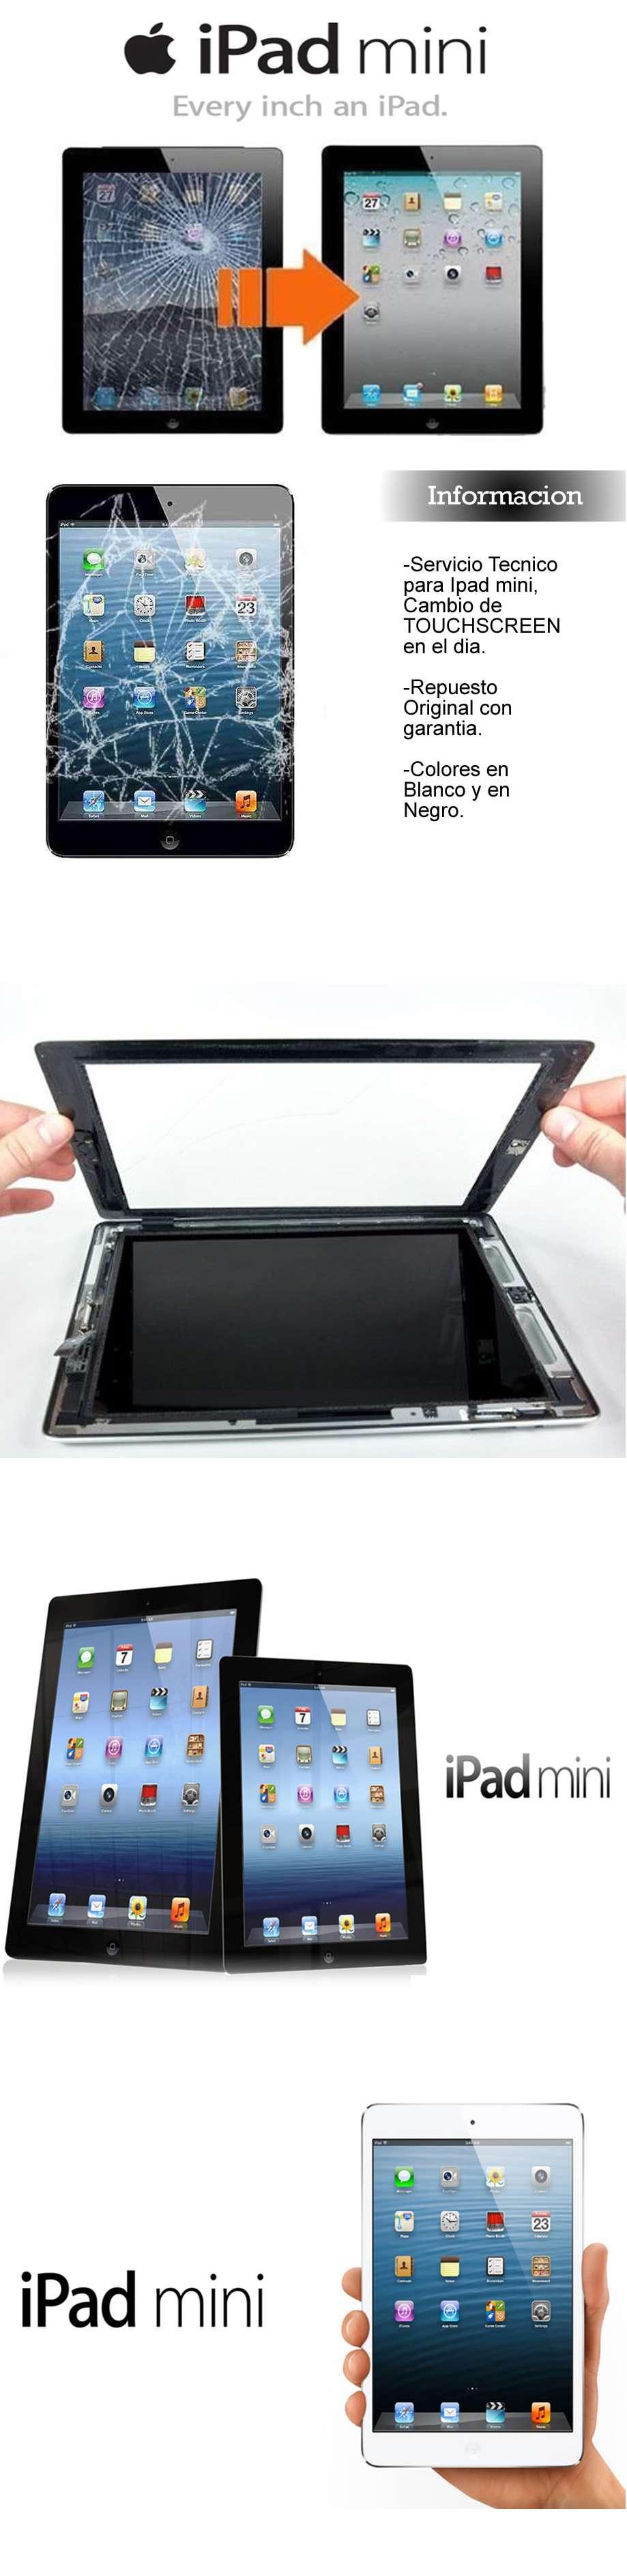 iPad_mini